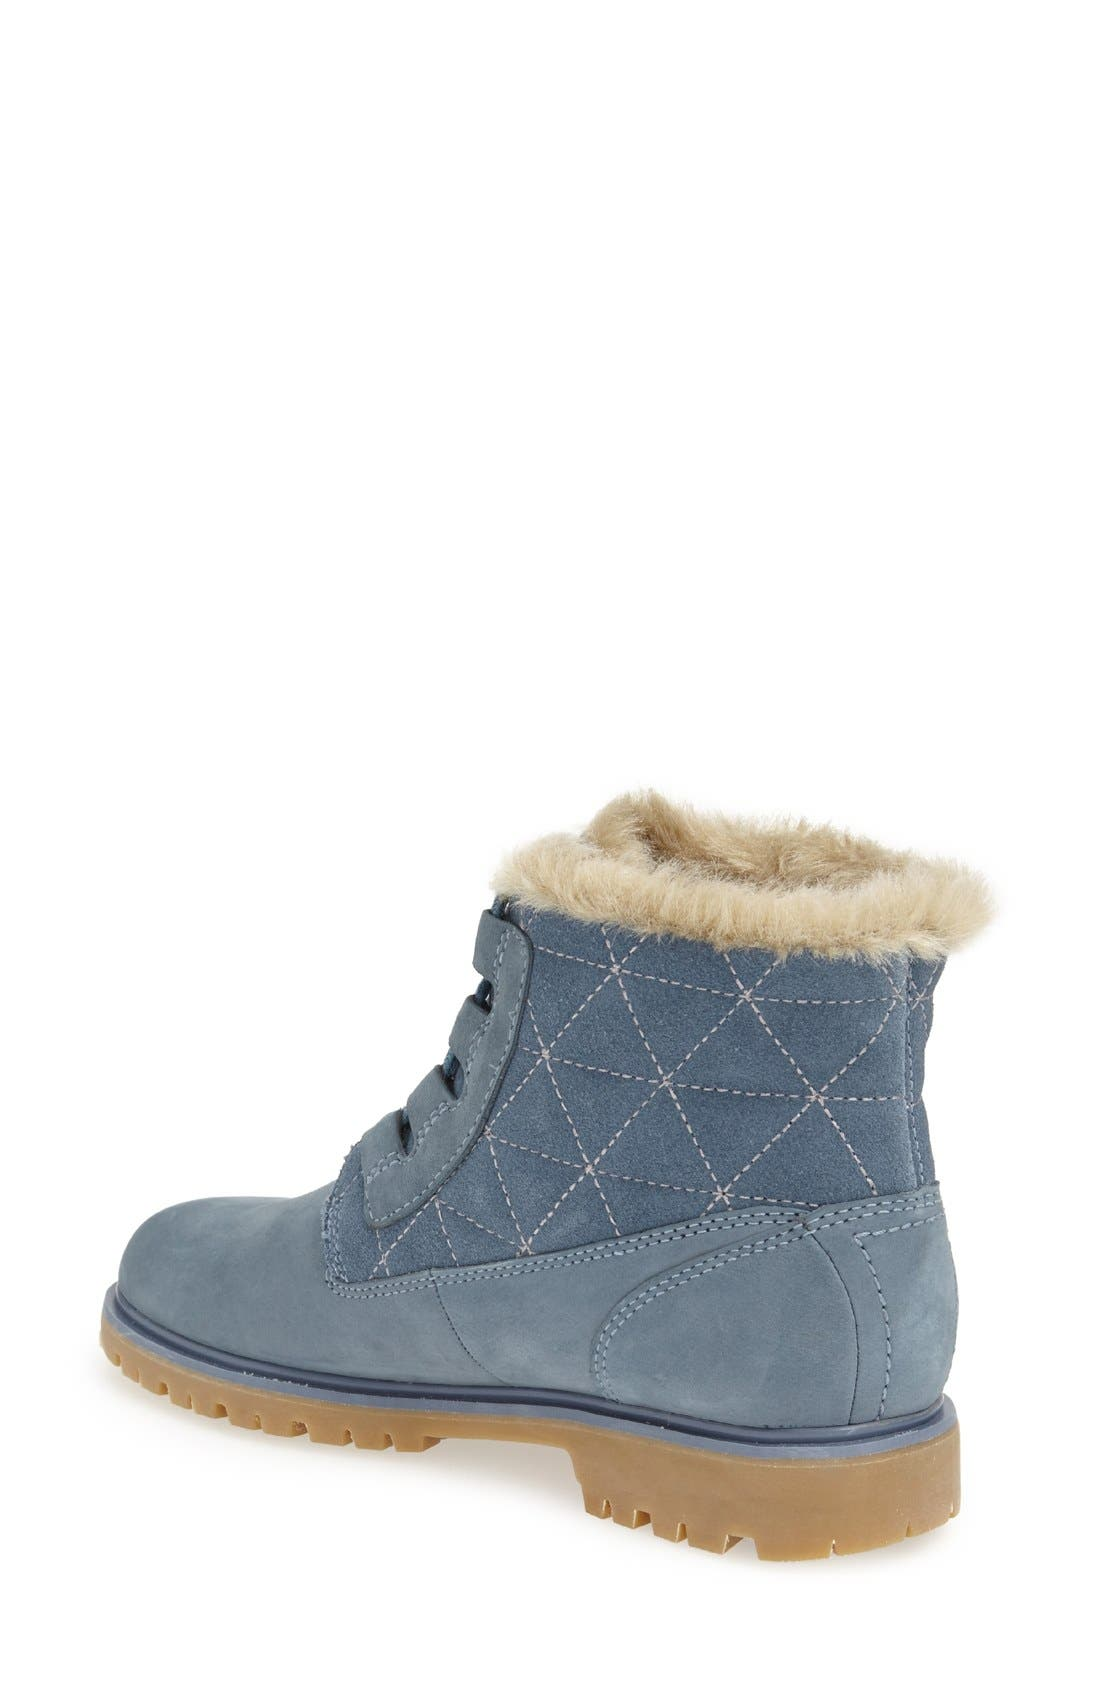 'Vega' Waterproof Leather Boot,                             Alternate thumbnail 2, color,                             Arctic Blue/ Natural